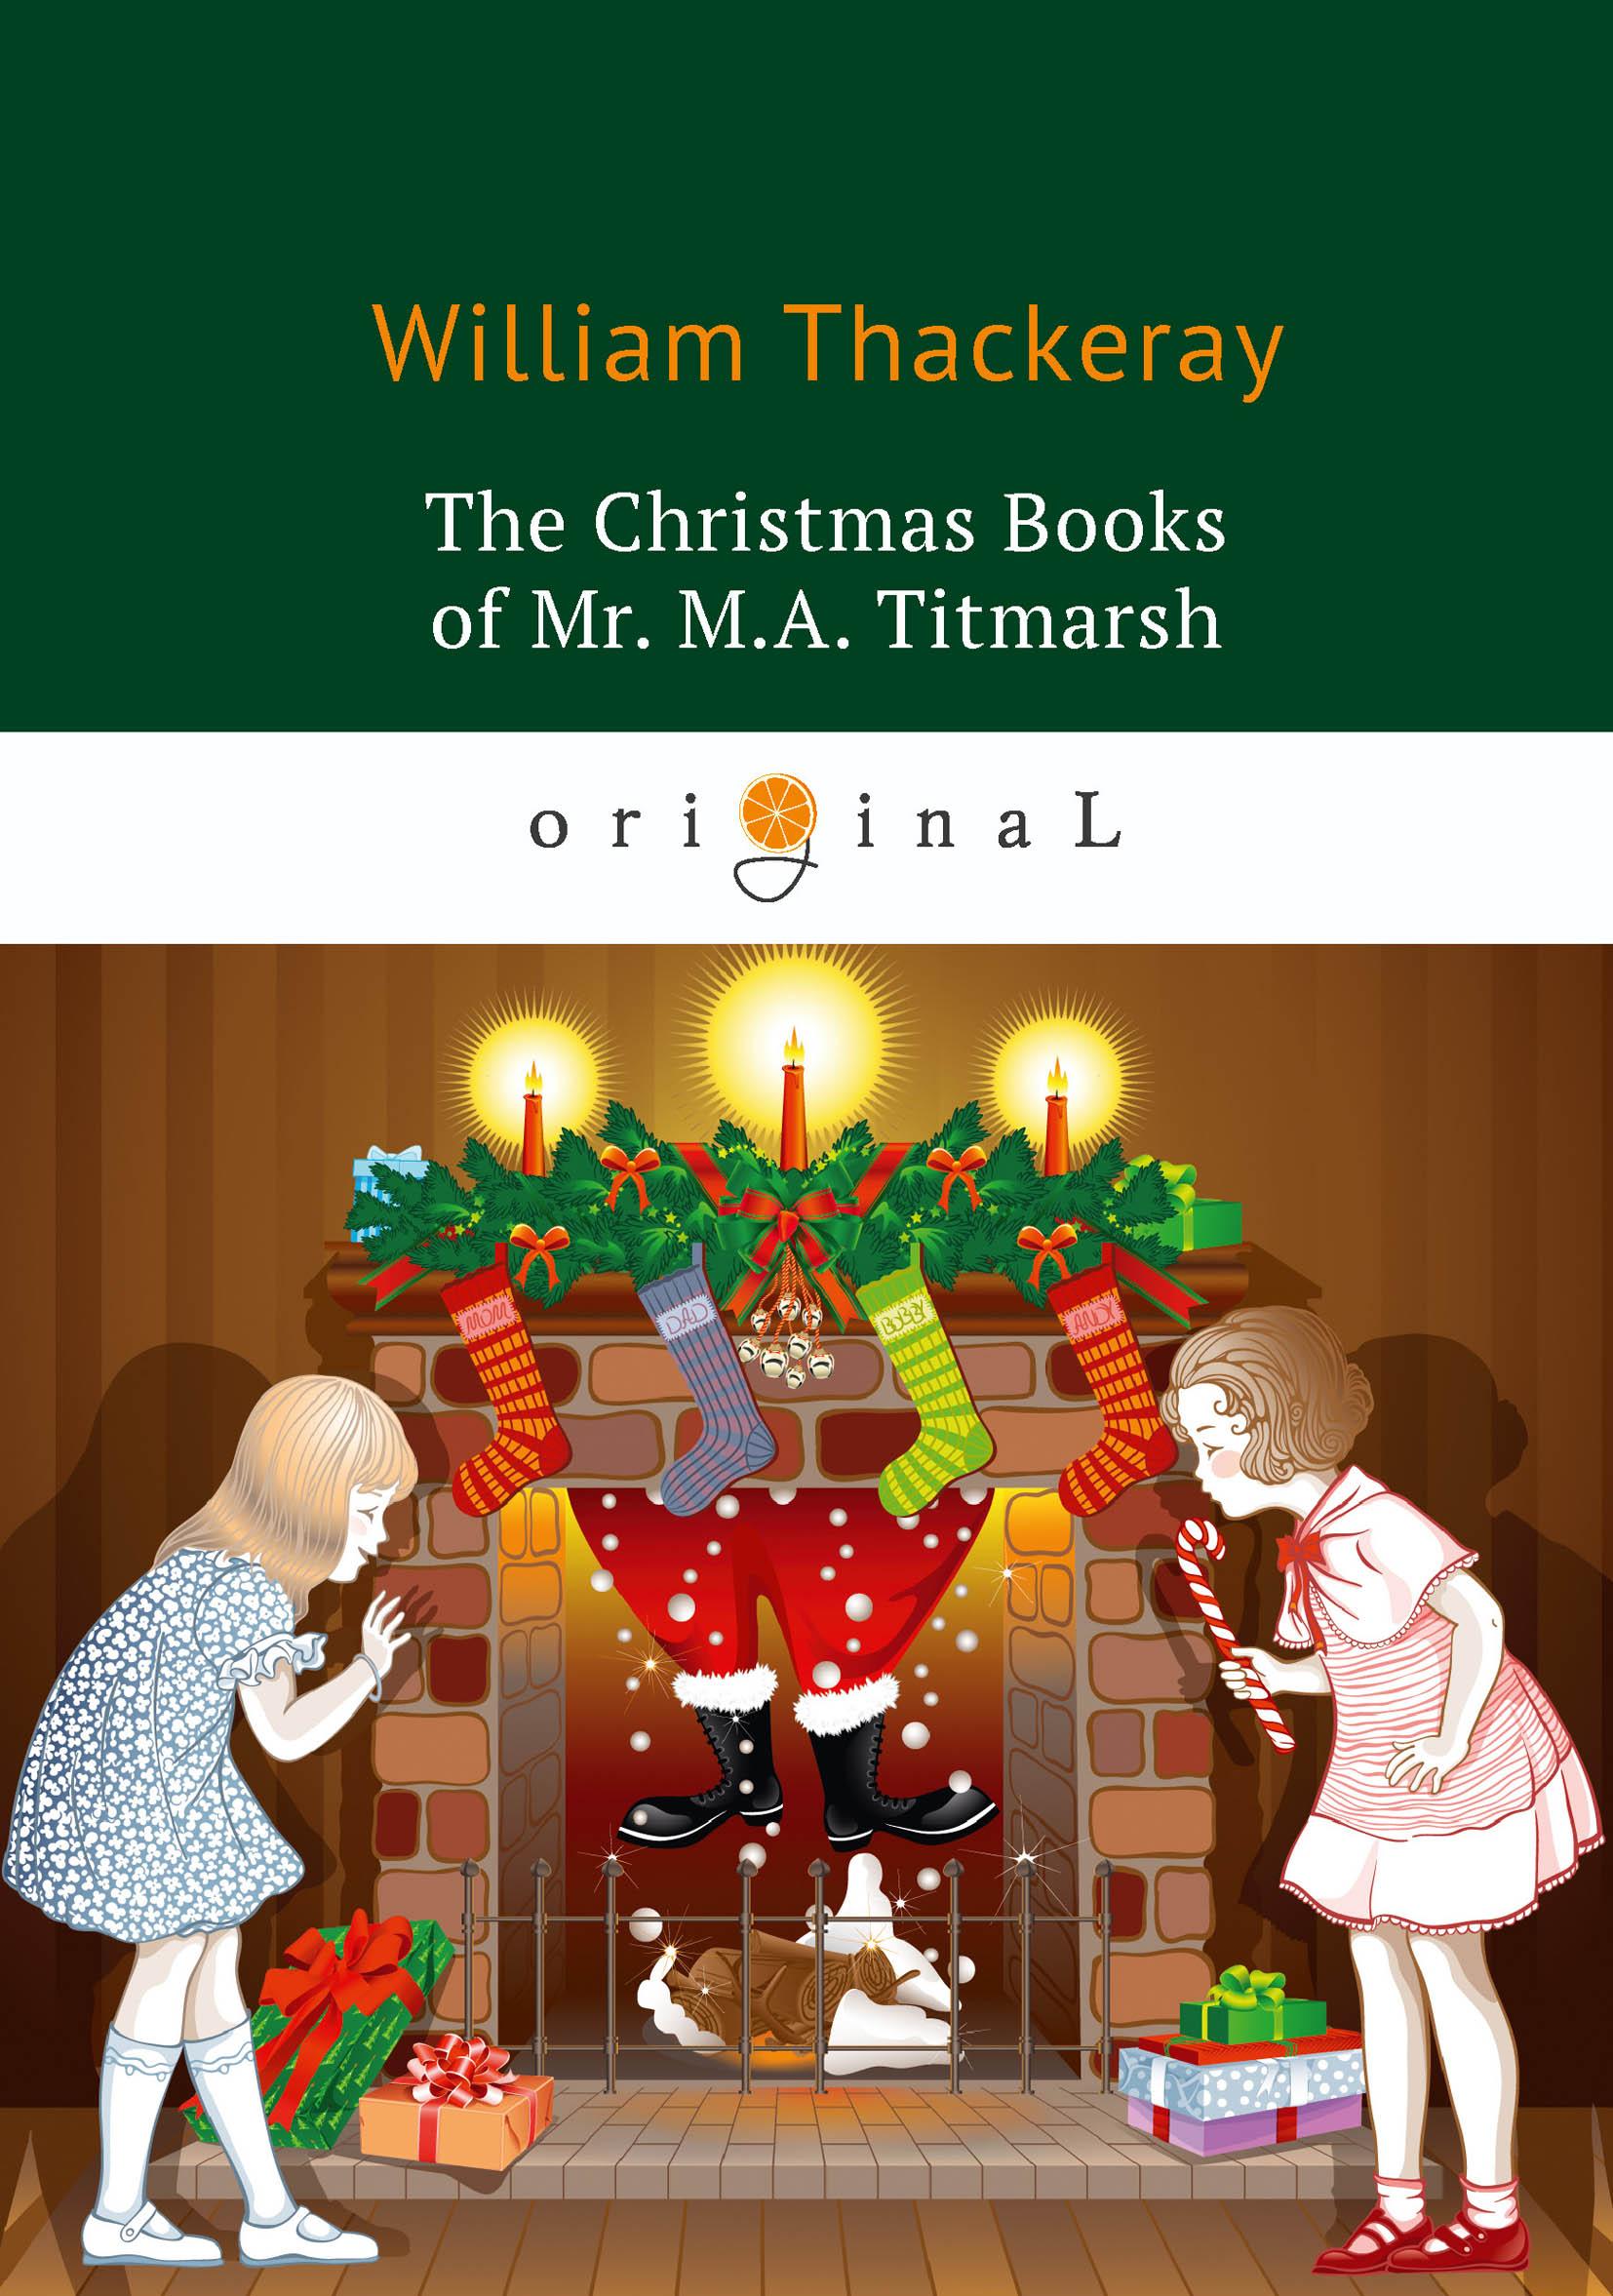 W. Thackeray The Christmas Books of Mr. M. A. Titmarsh